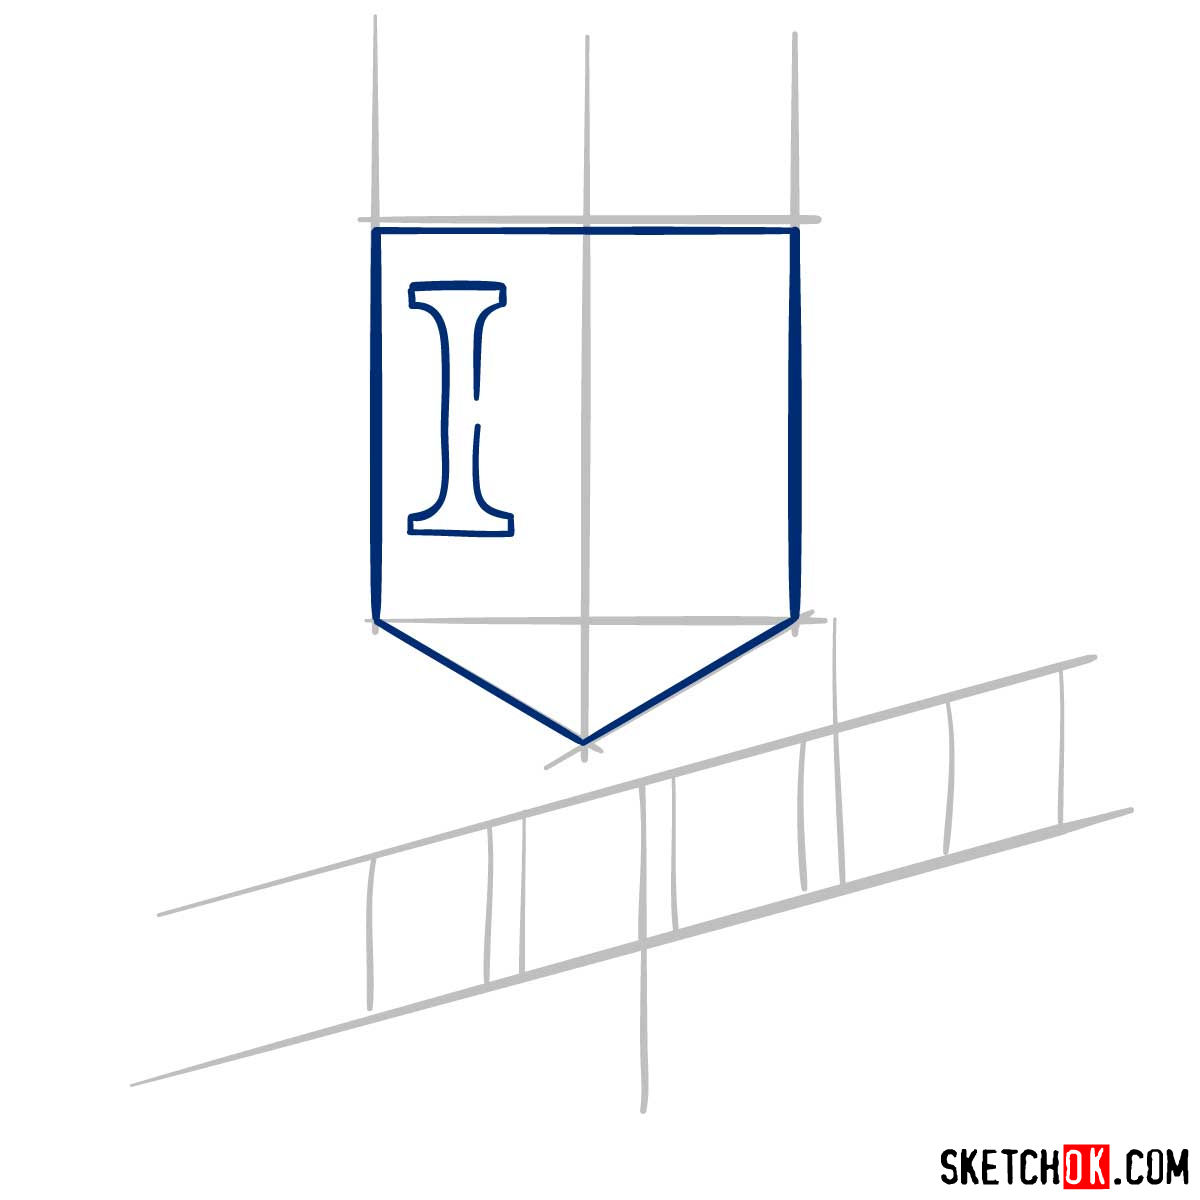 How to draw Kansas City Royals logo | MLB logos - step 03